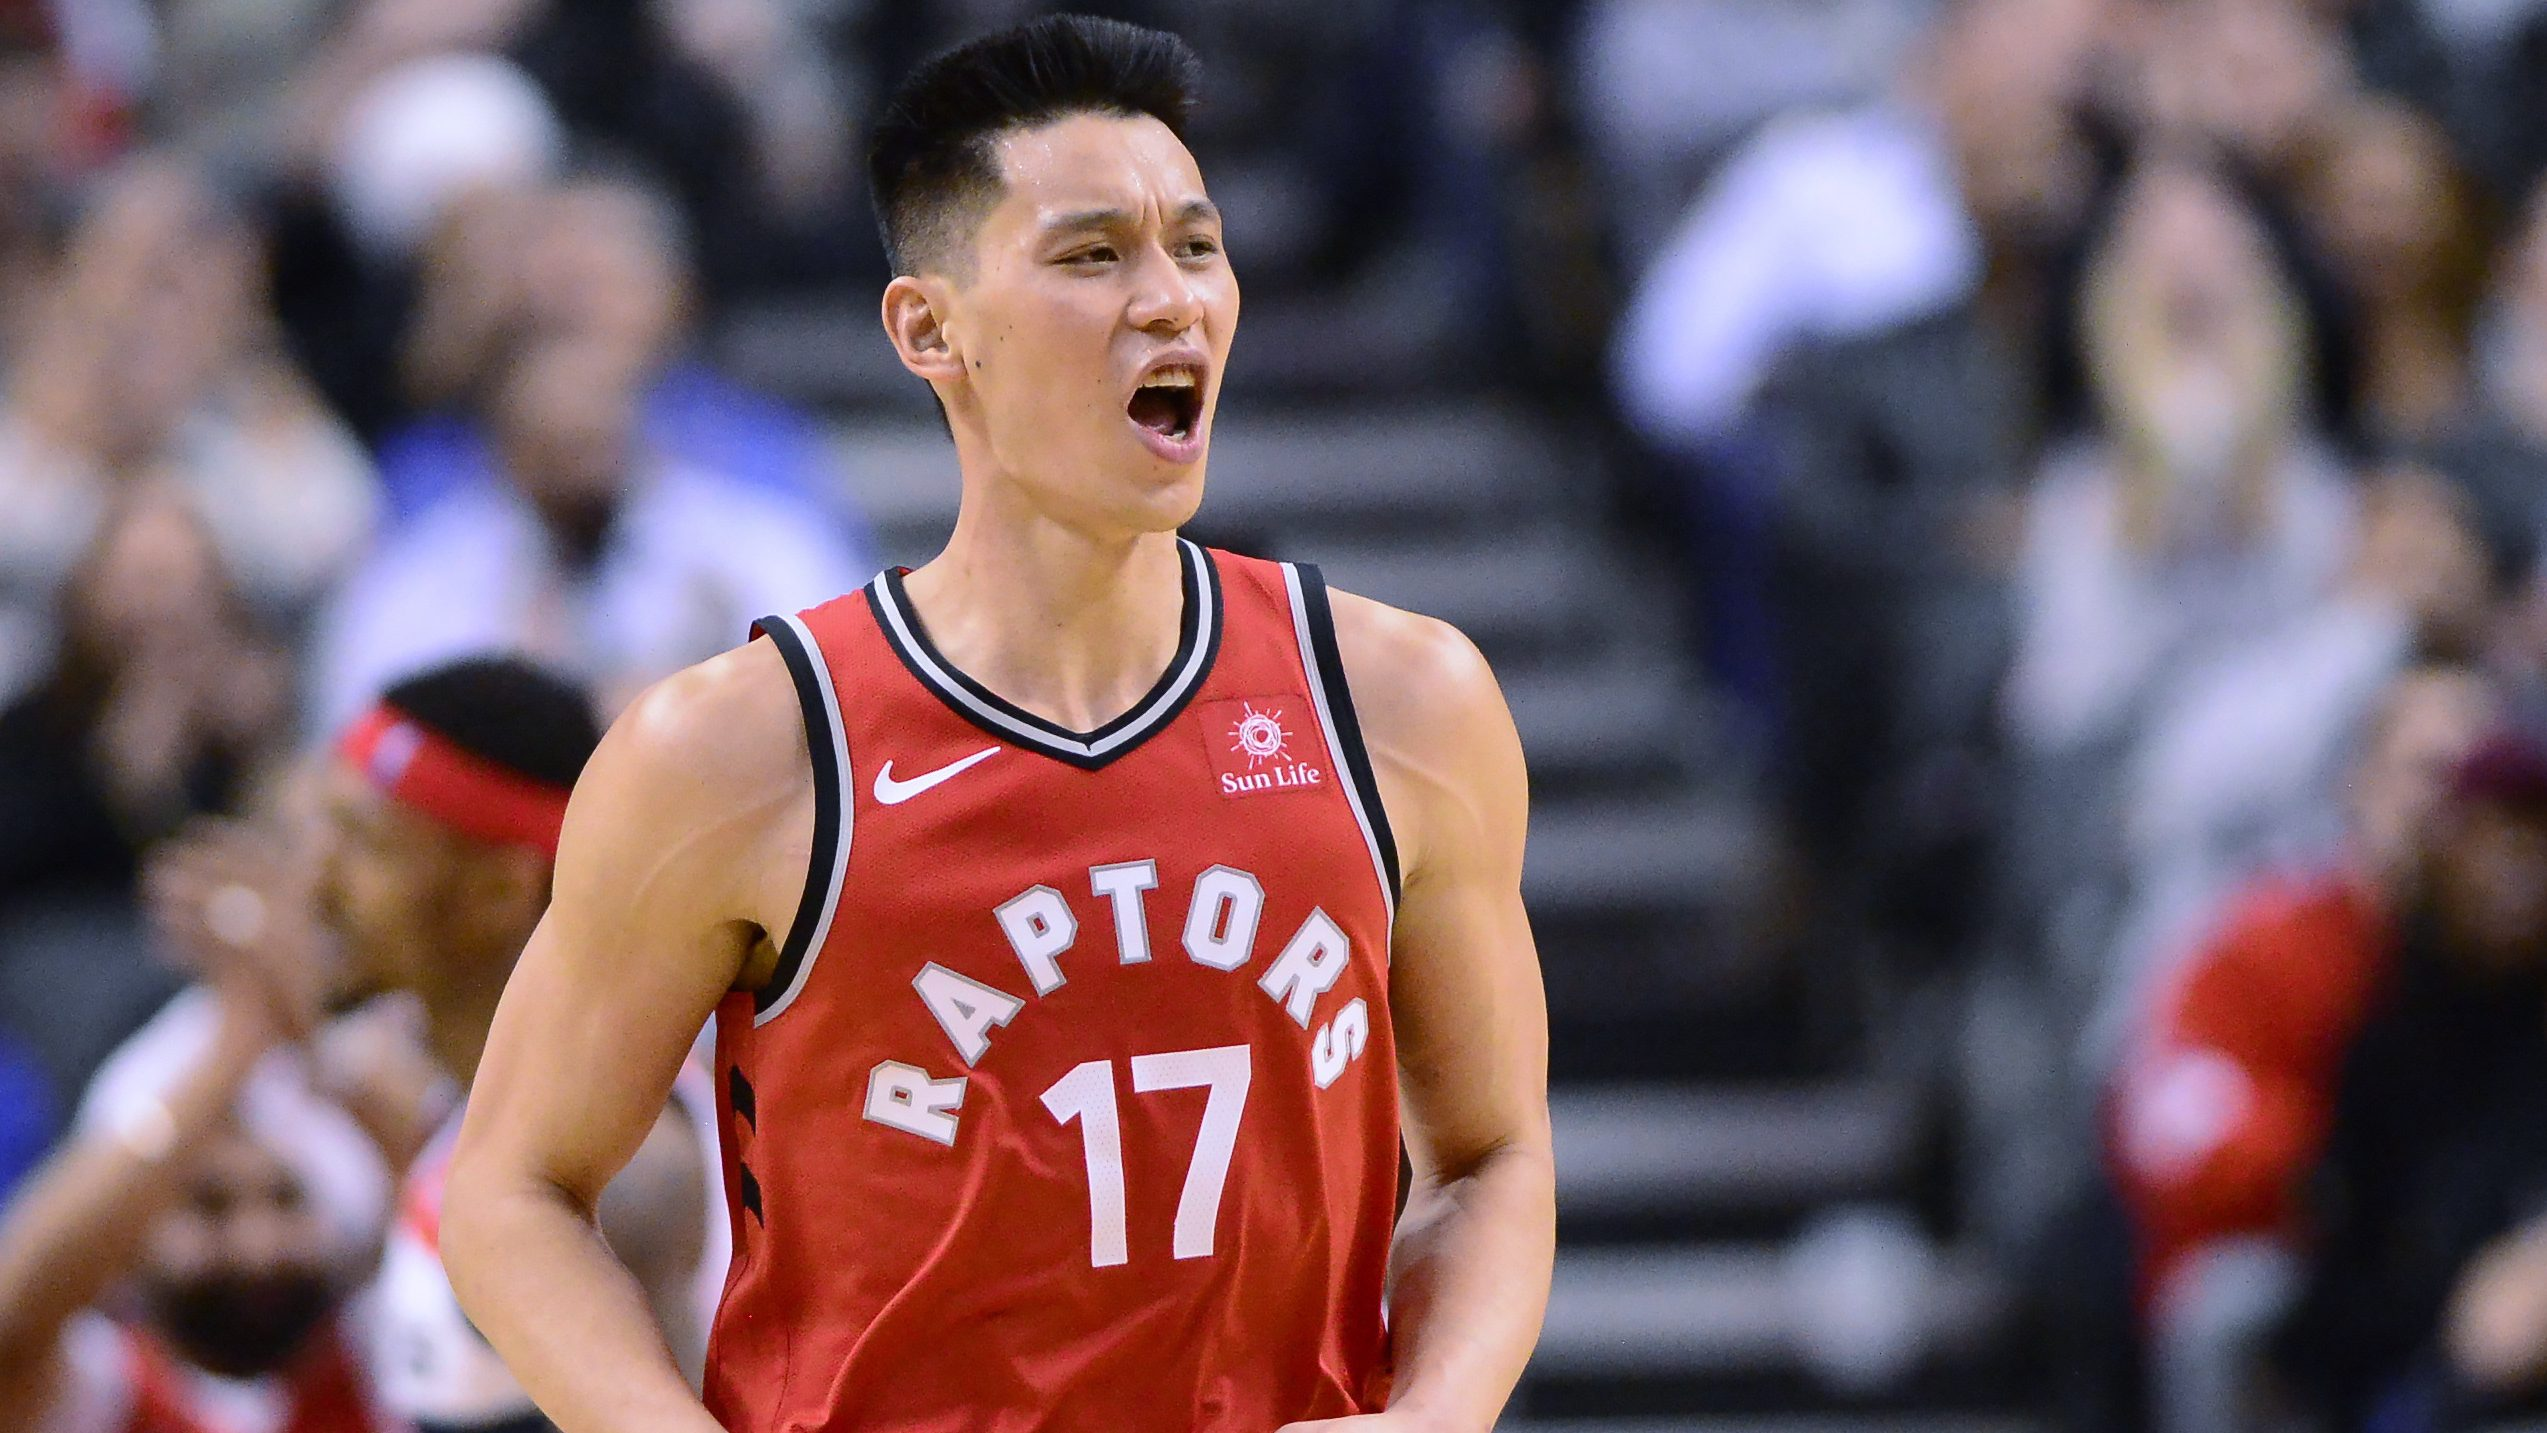 de6550b7da6 Jeremy Lin: 'There's definitely some bittersweetness to my career'